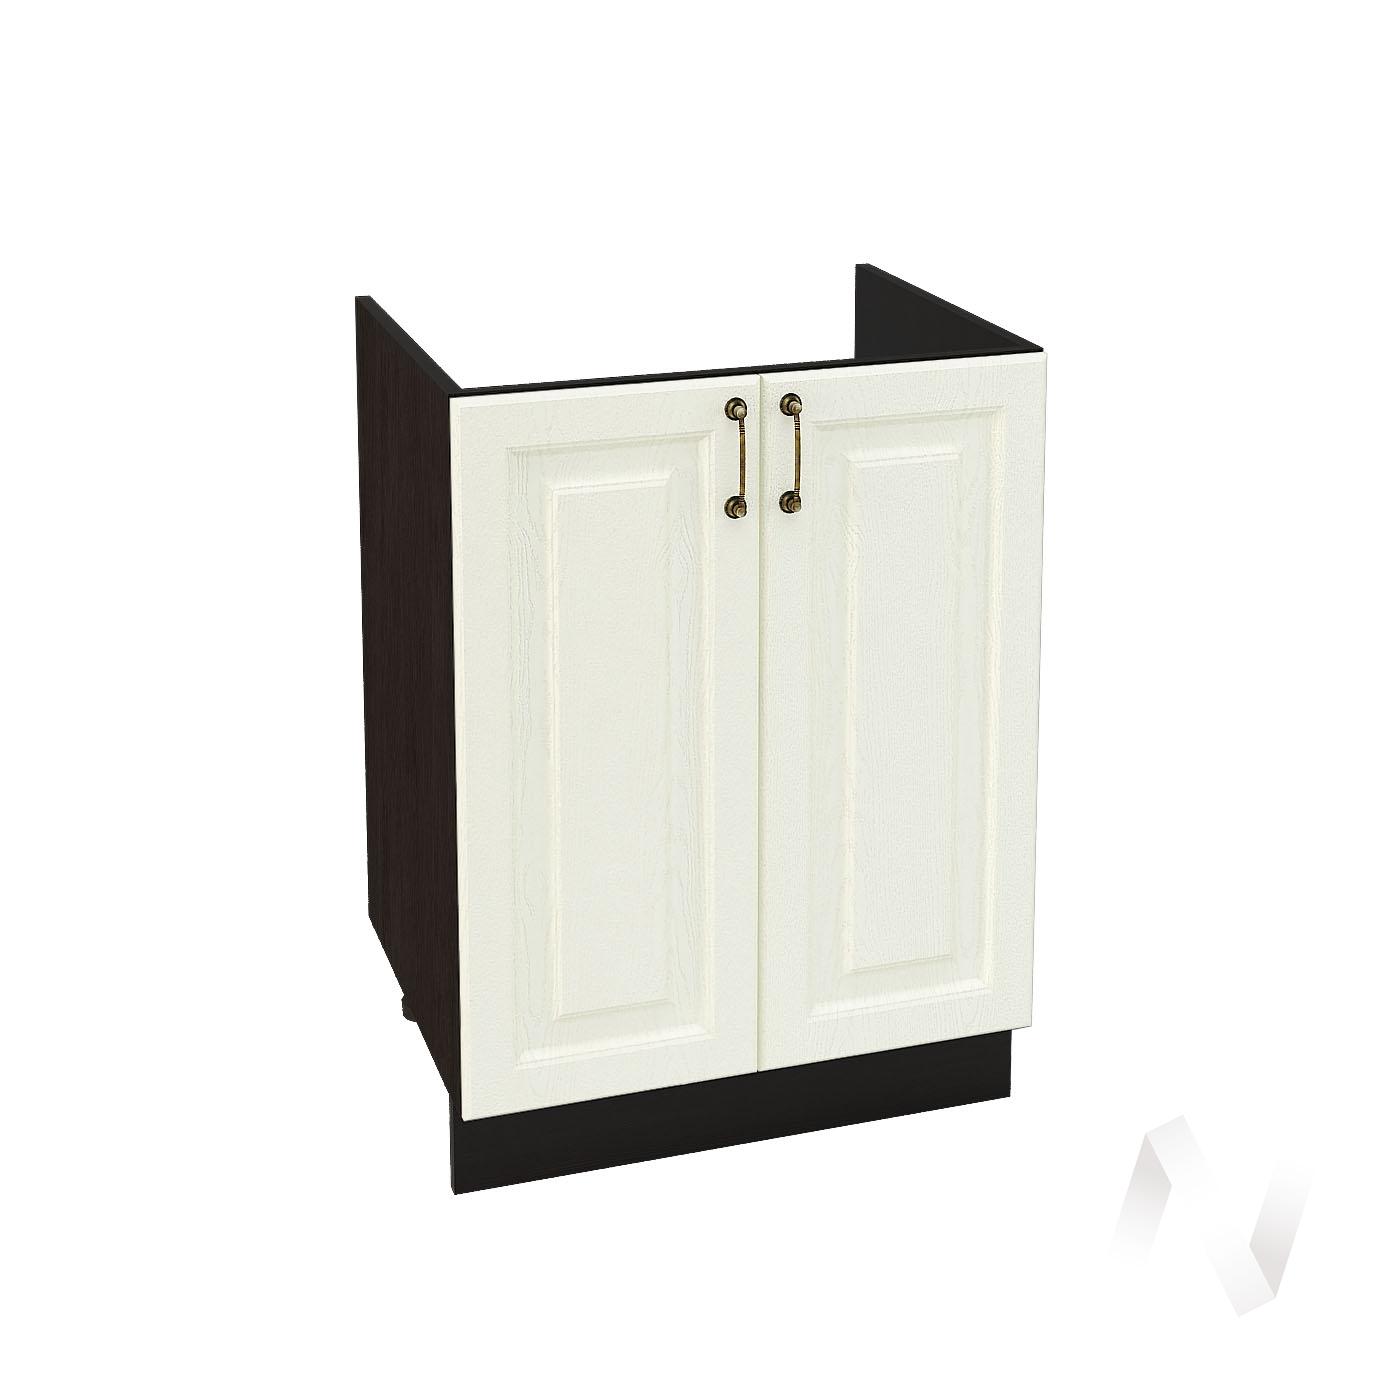 "Кухня ""Ницца"": Шкаф нижний под мойку 600, ШНМ 600 (Крем/корпус венге)"